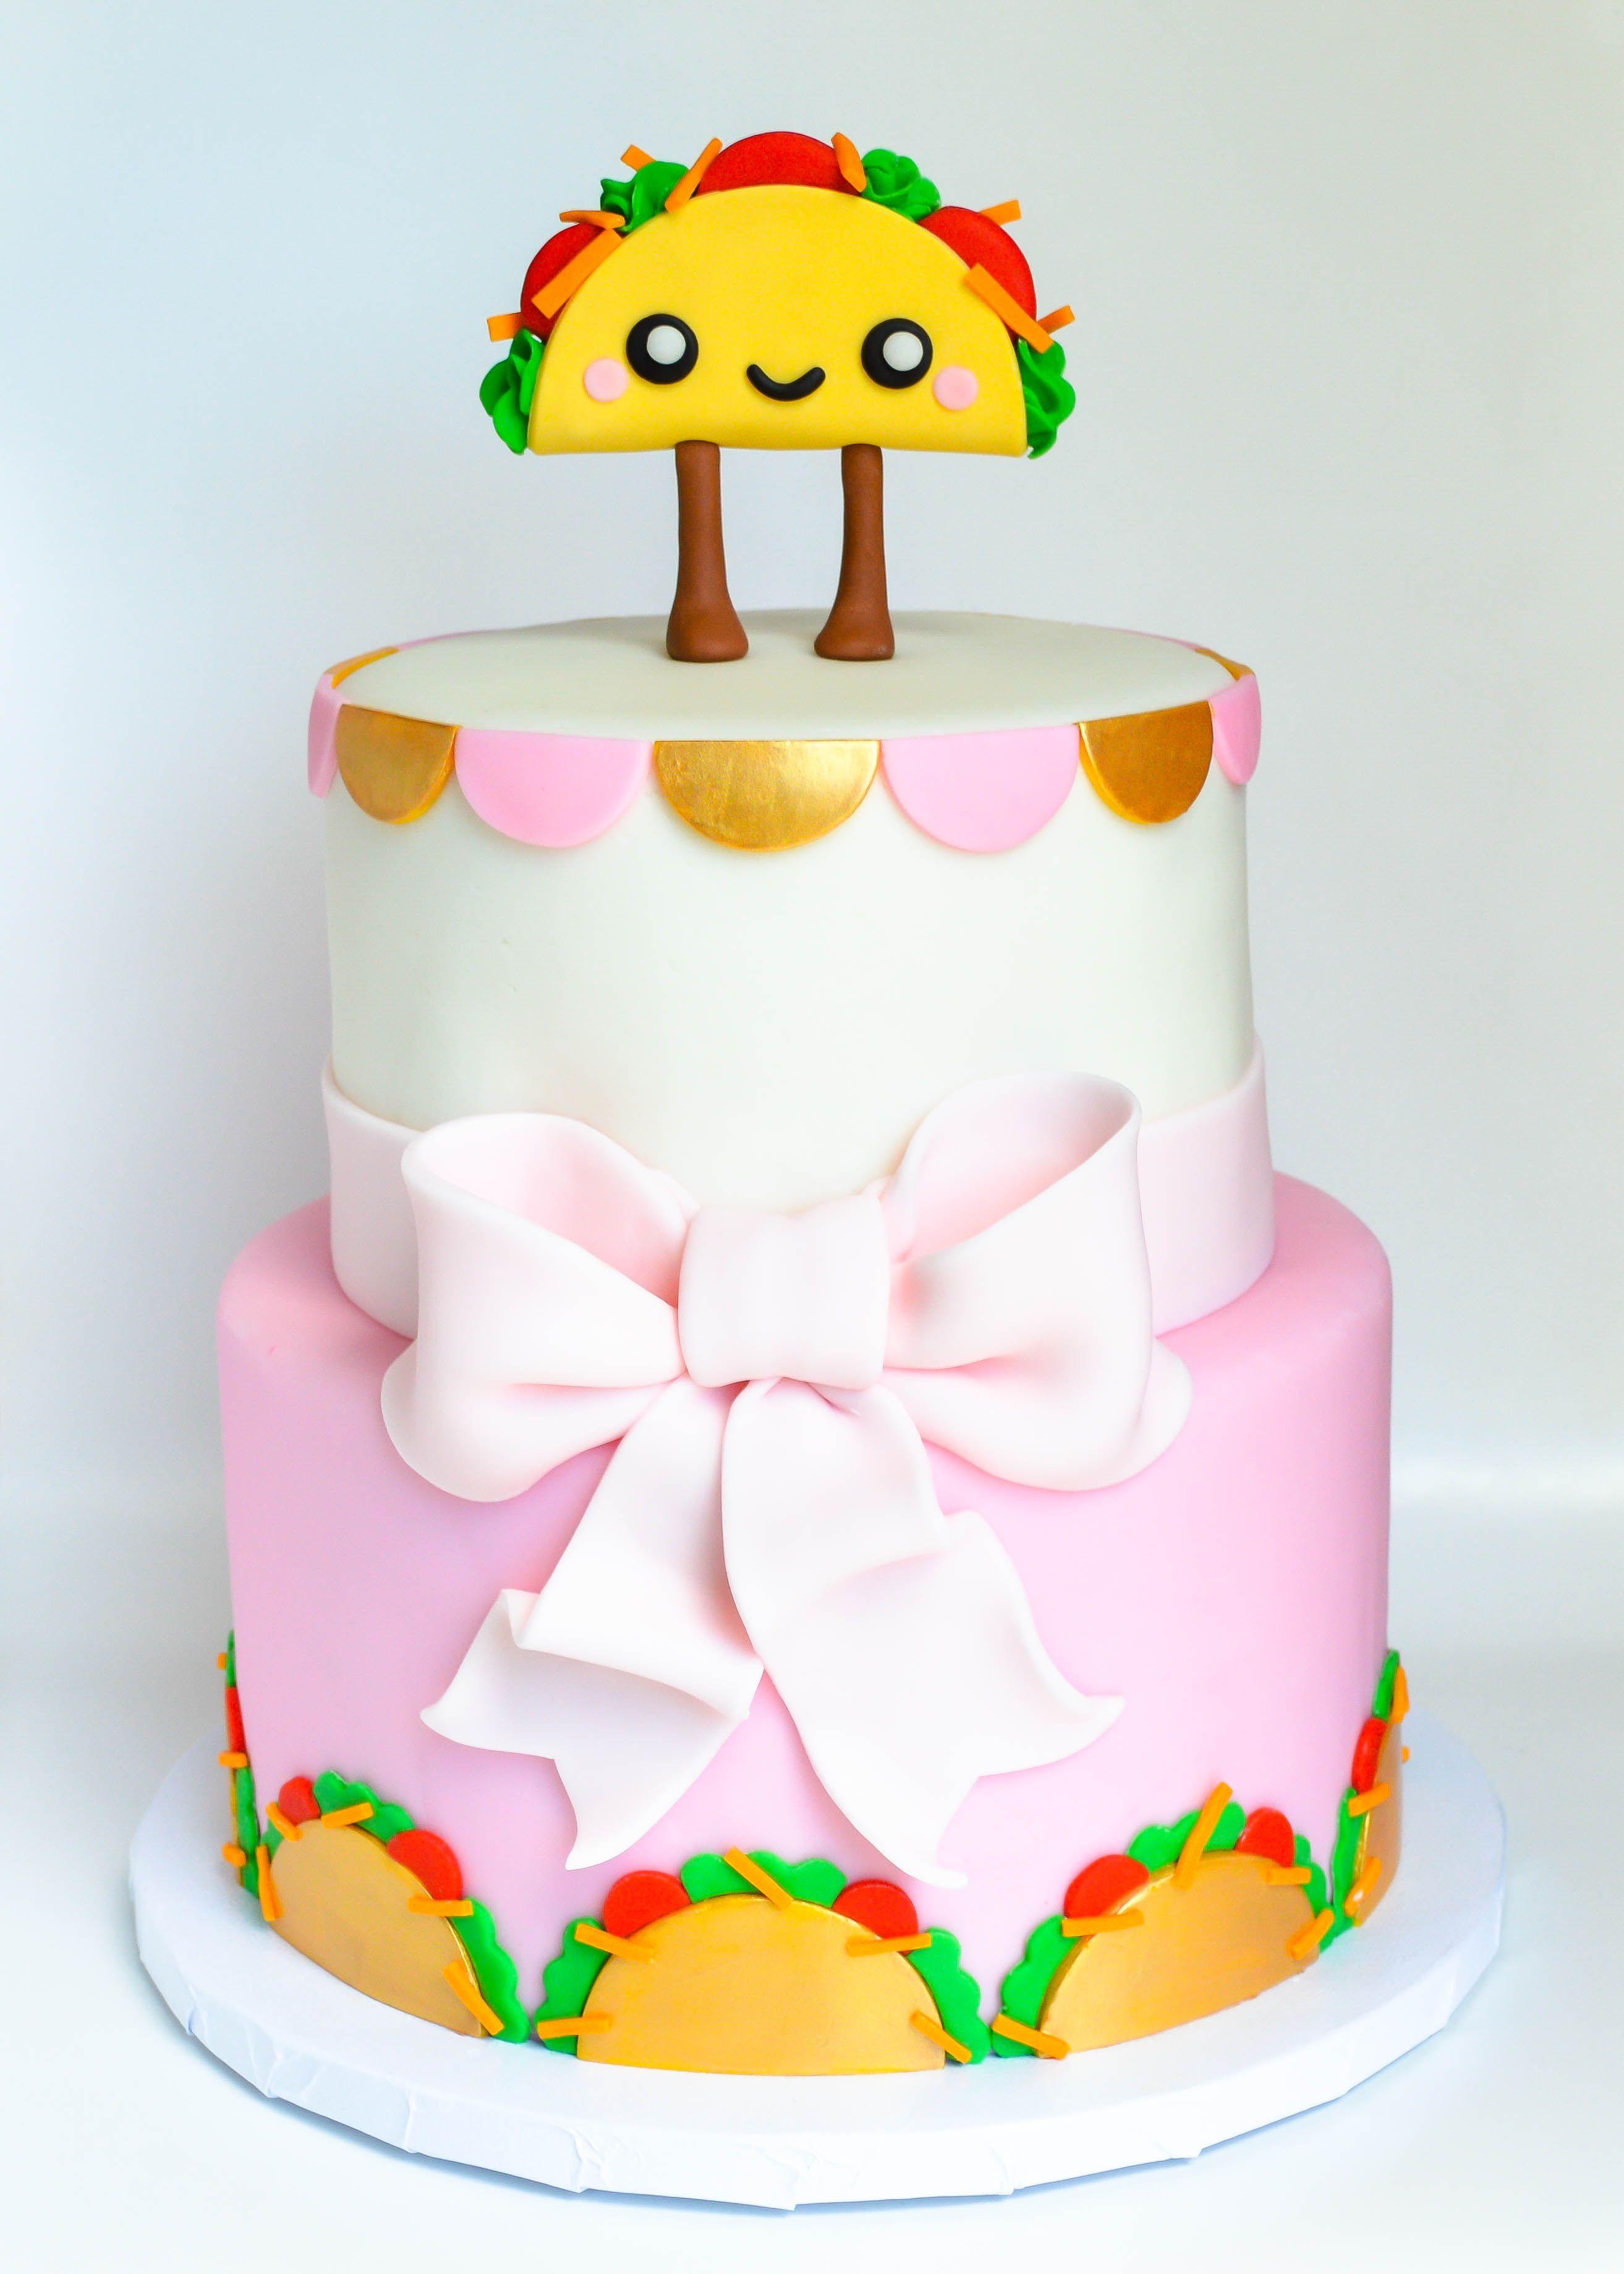 kawaii taco cake jam cakes Pinterest Taco cake Cake and Birthdays